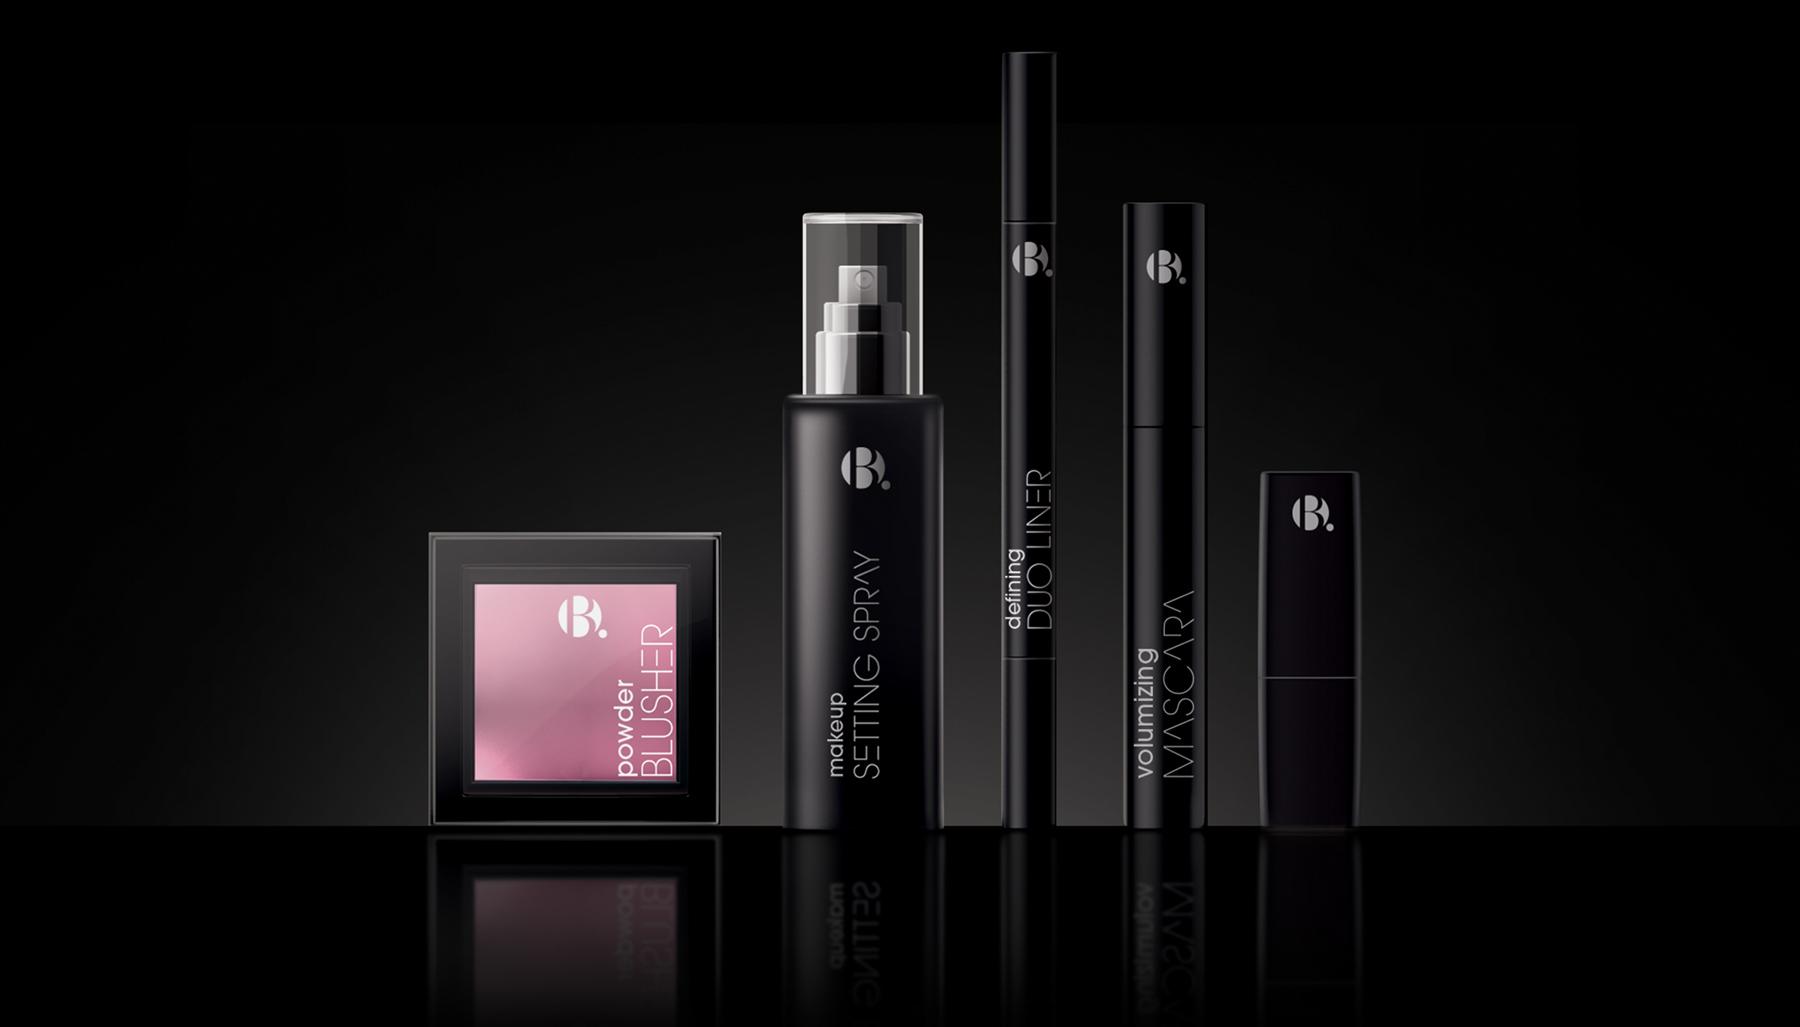 B. cosmetic product range branded by Biles Hendry